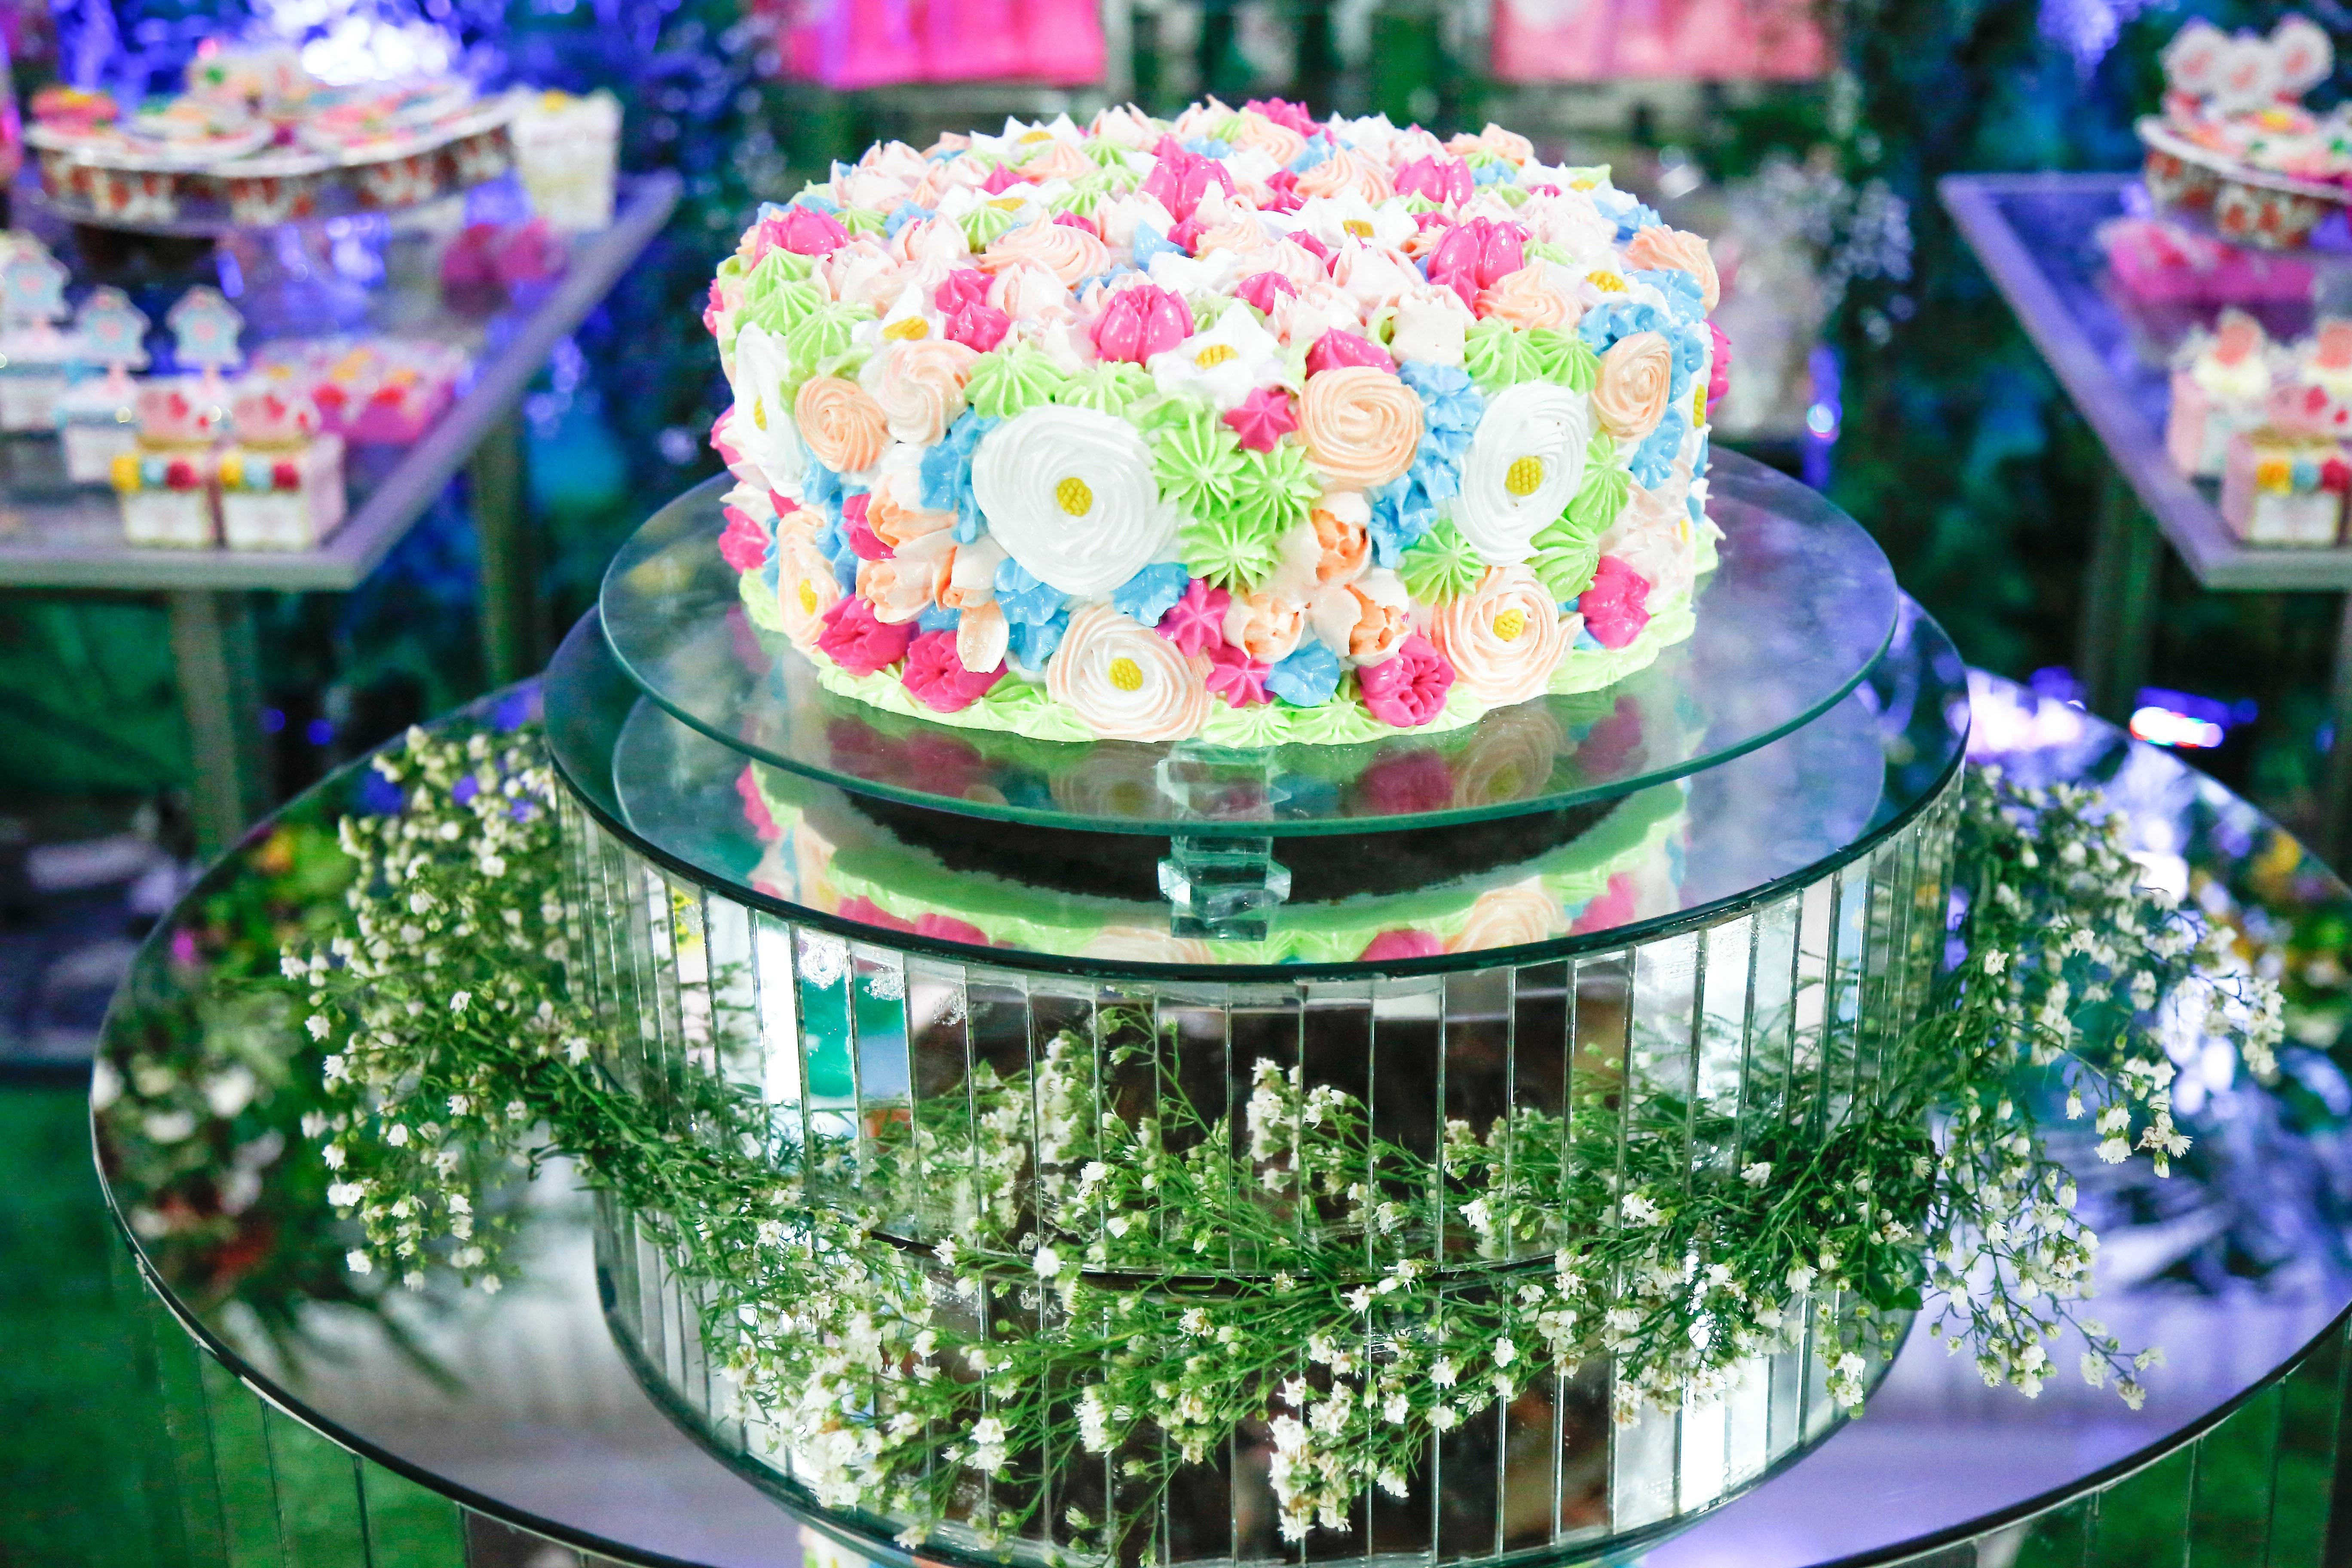 Free stock photo of birthday cake flower cake happy birthday free download izmirmasajfo